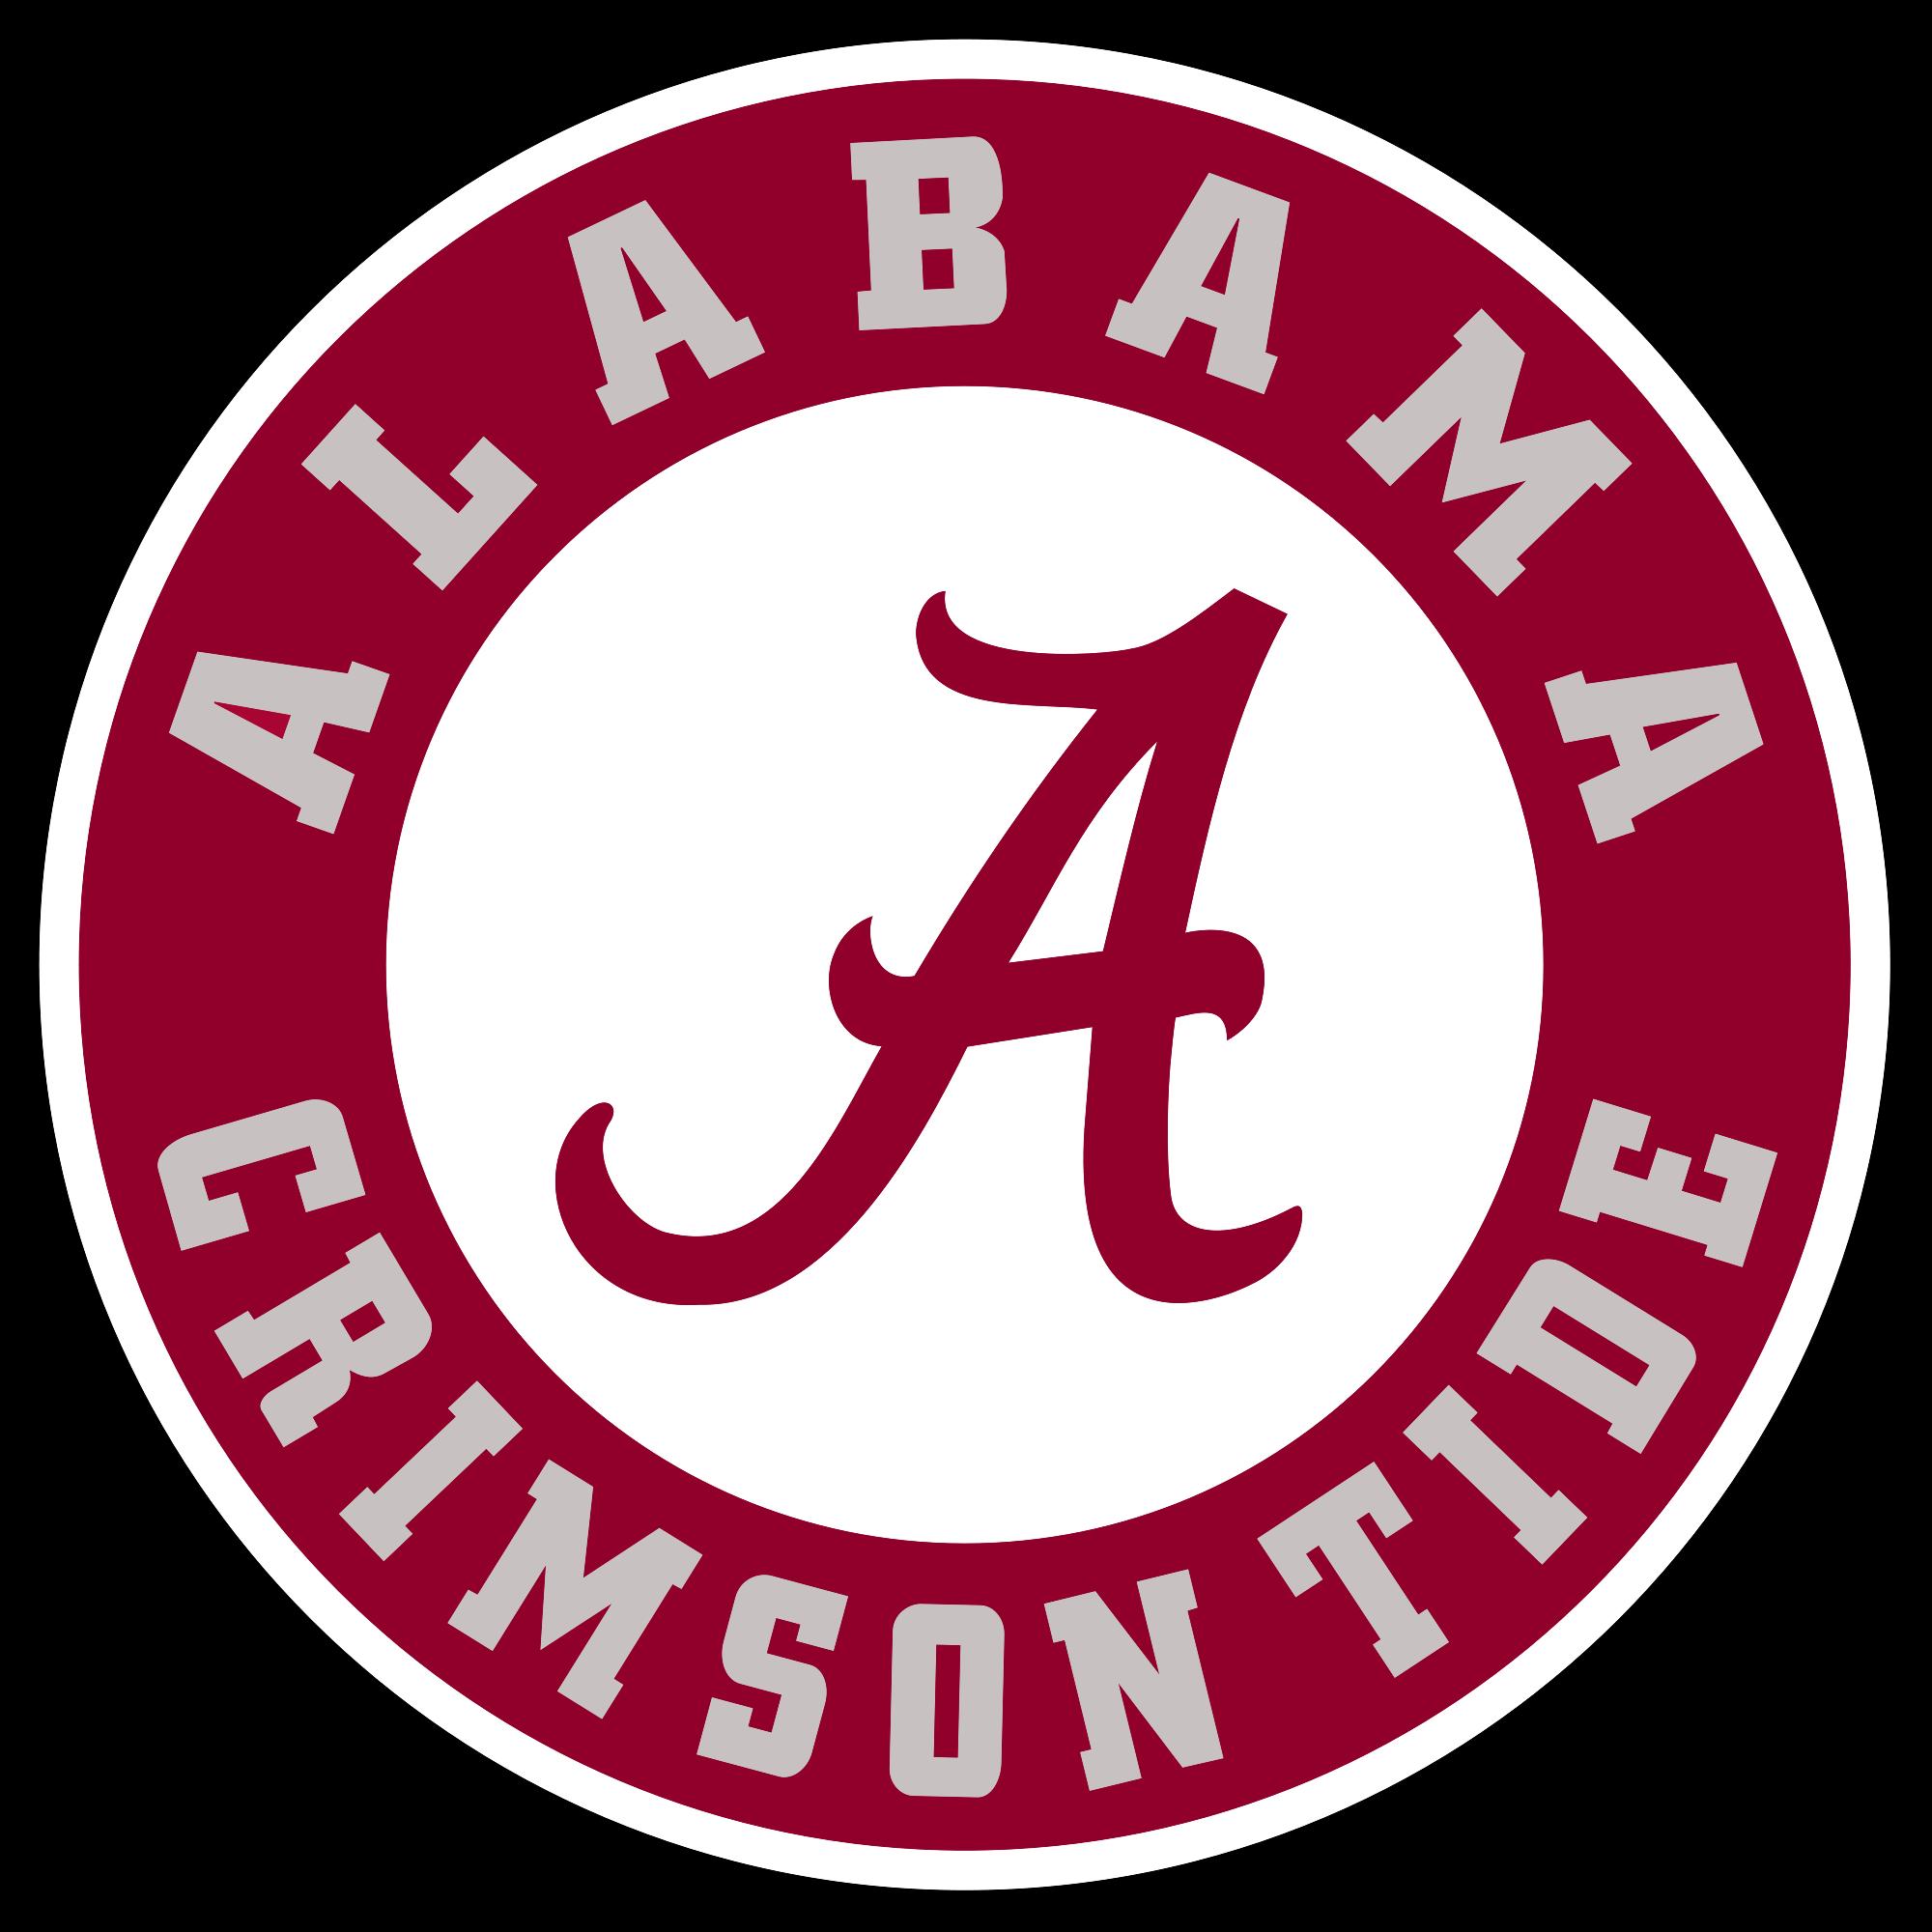 Alabama clipart football jpg royalty free library Alabama Clip Art Football | Clipart Panda - Free Clipart Images jpg royalty free library